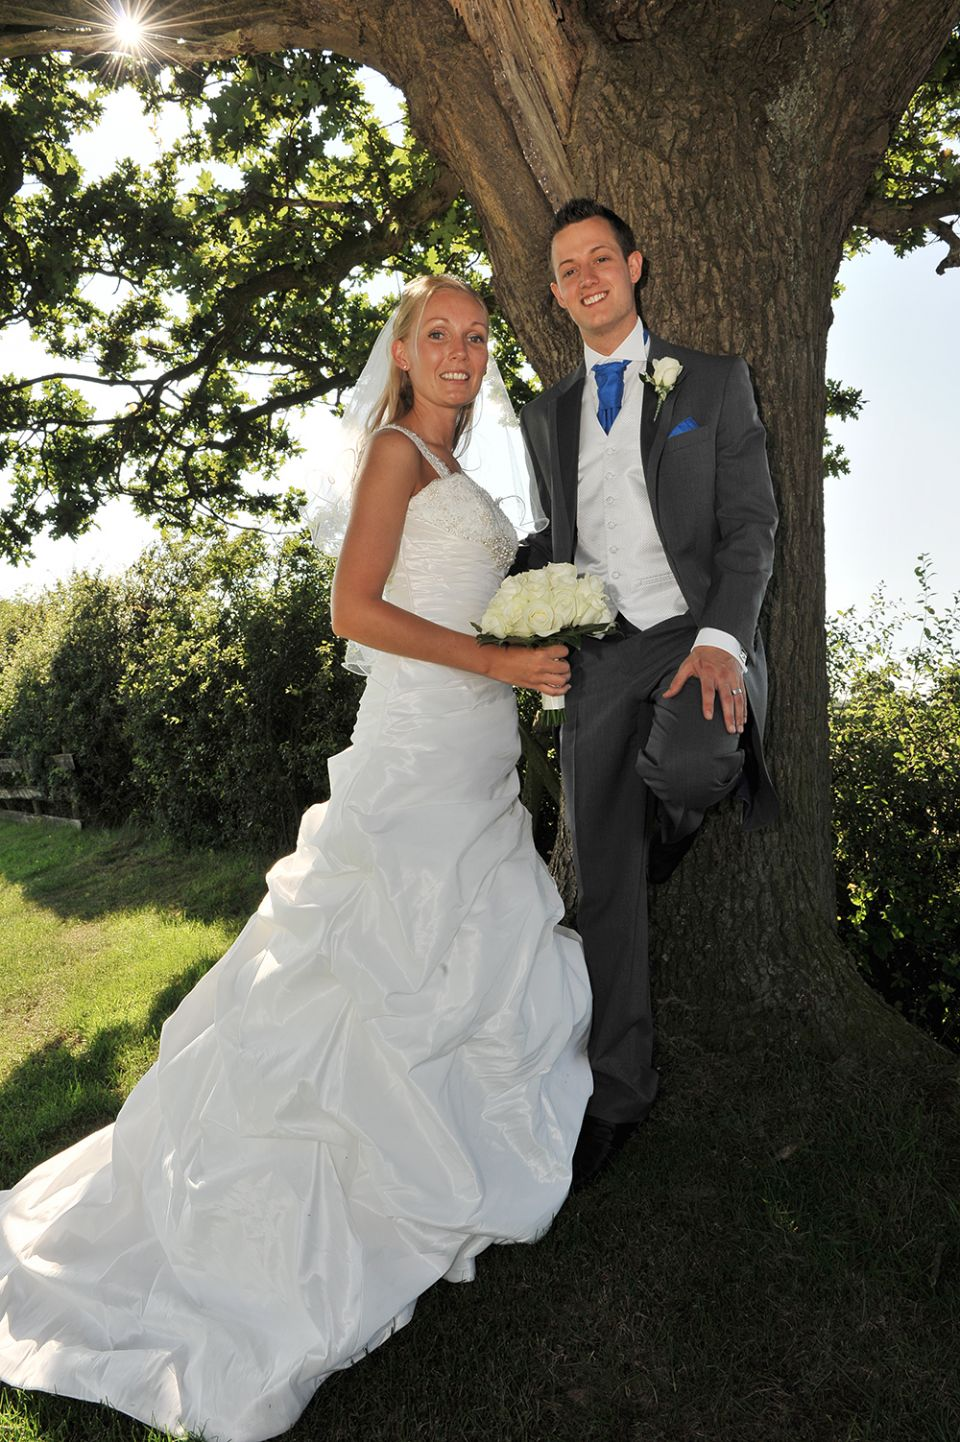 Brie & Groom Pics :) | Wedding Styles